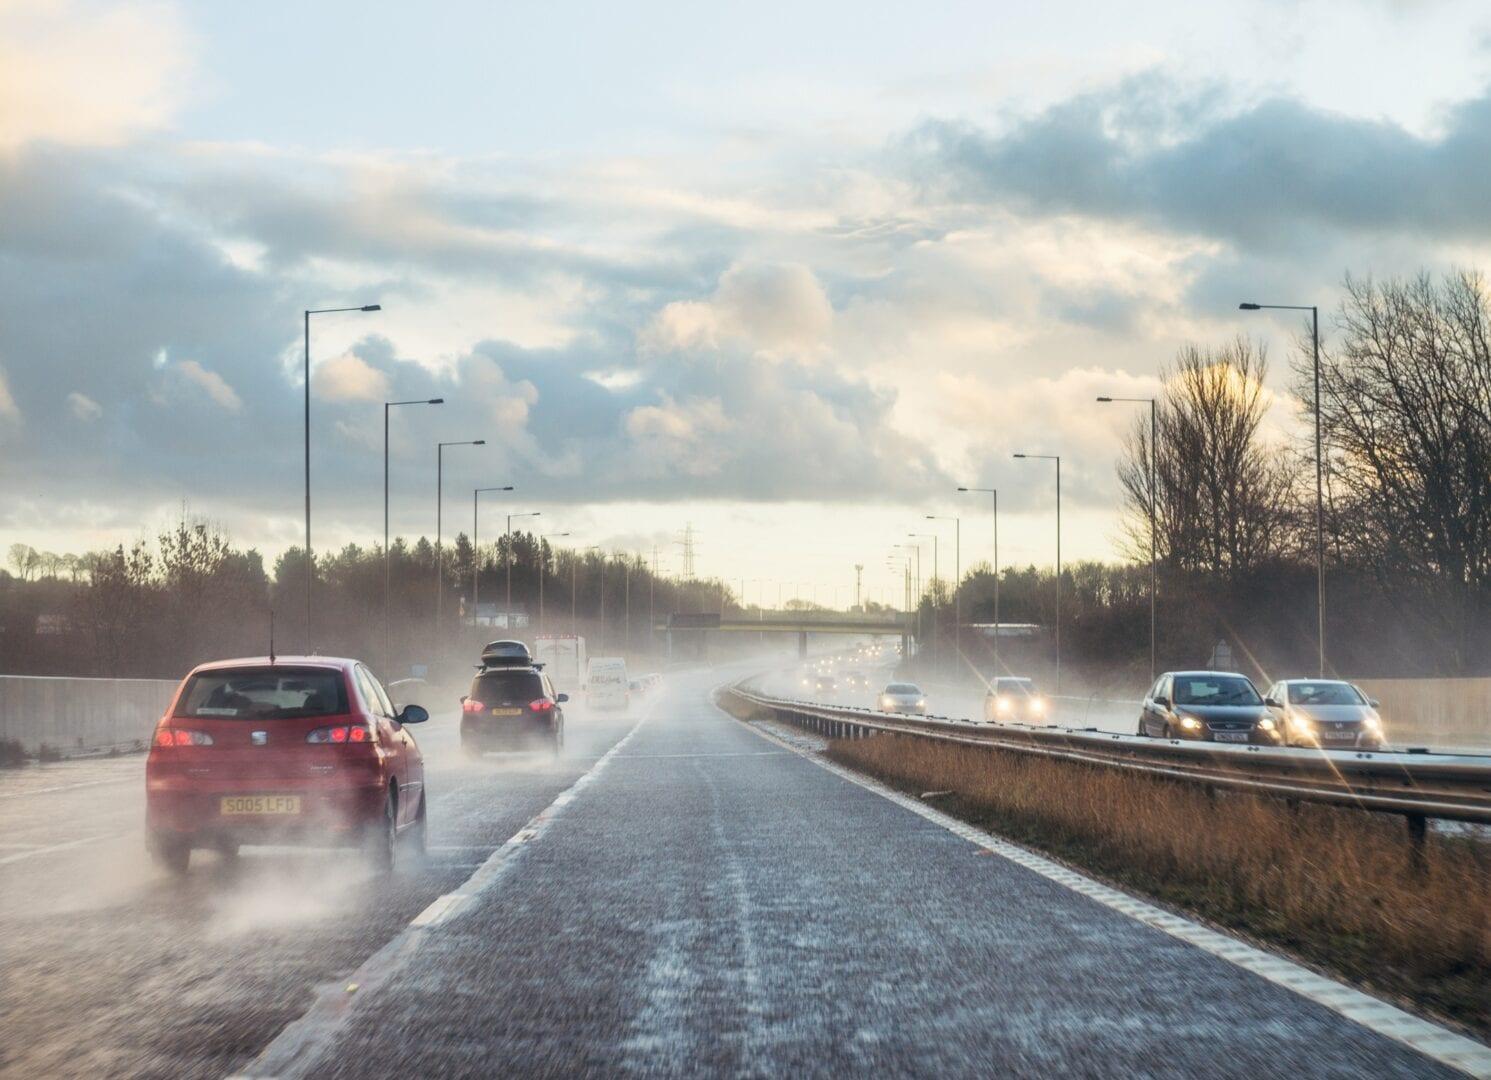 Wet British motorway traffic